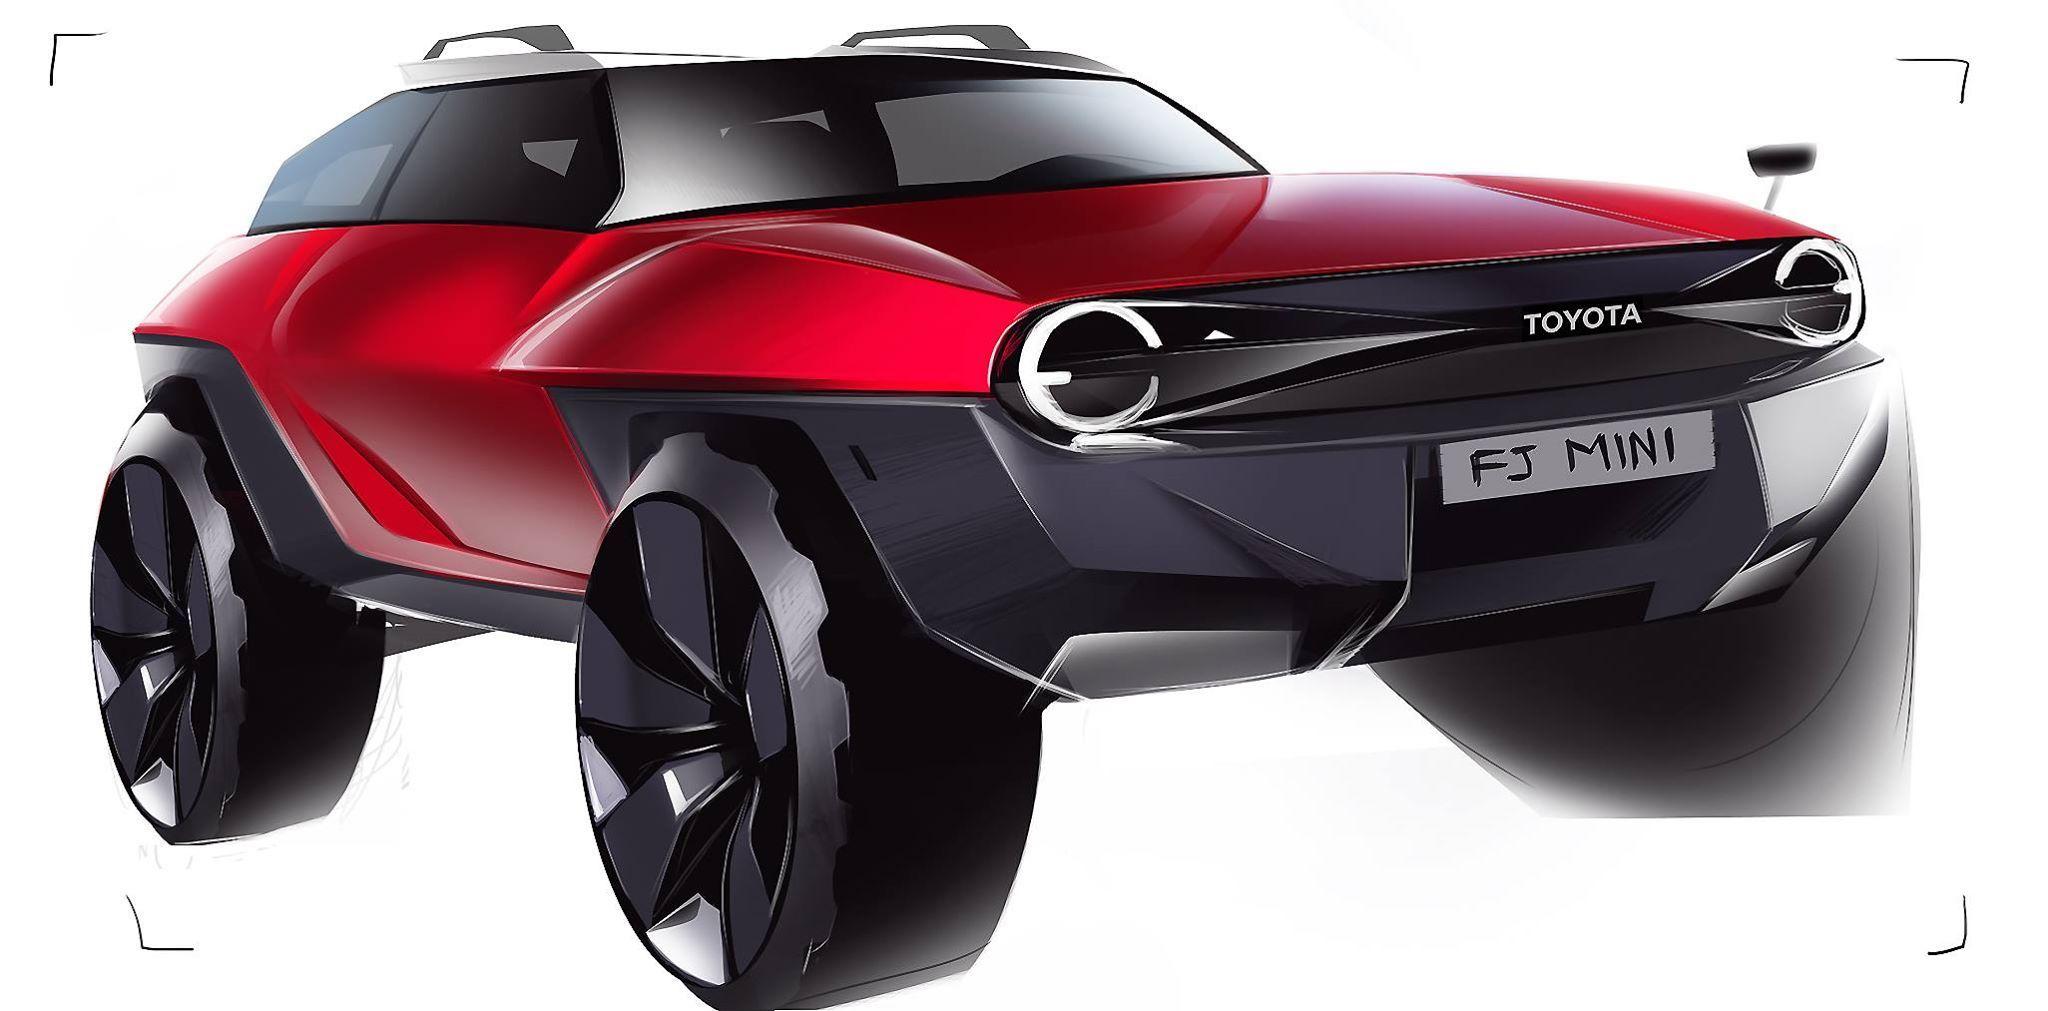 Toyota-Mini-FJ-Cruiser-Design-Sketch-by-Alvin-Tseng-ACCD-Trans-Sketch-off.jpg (2048×1011)